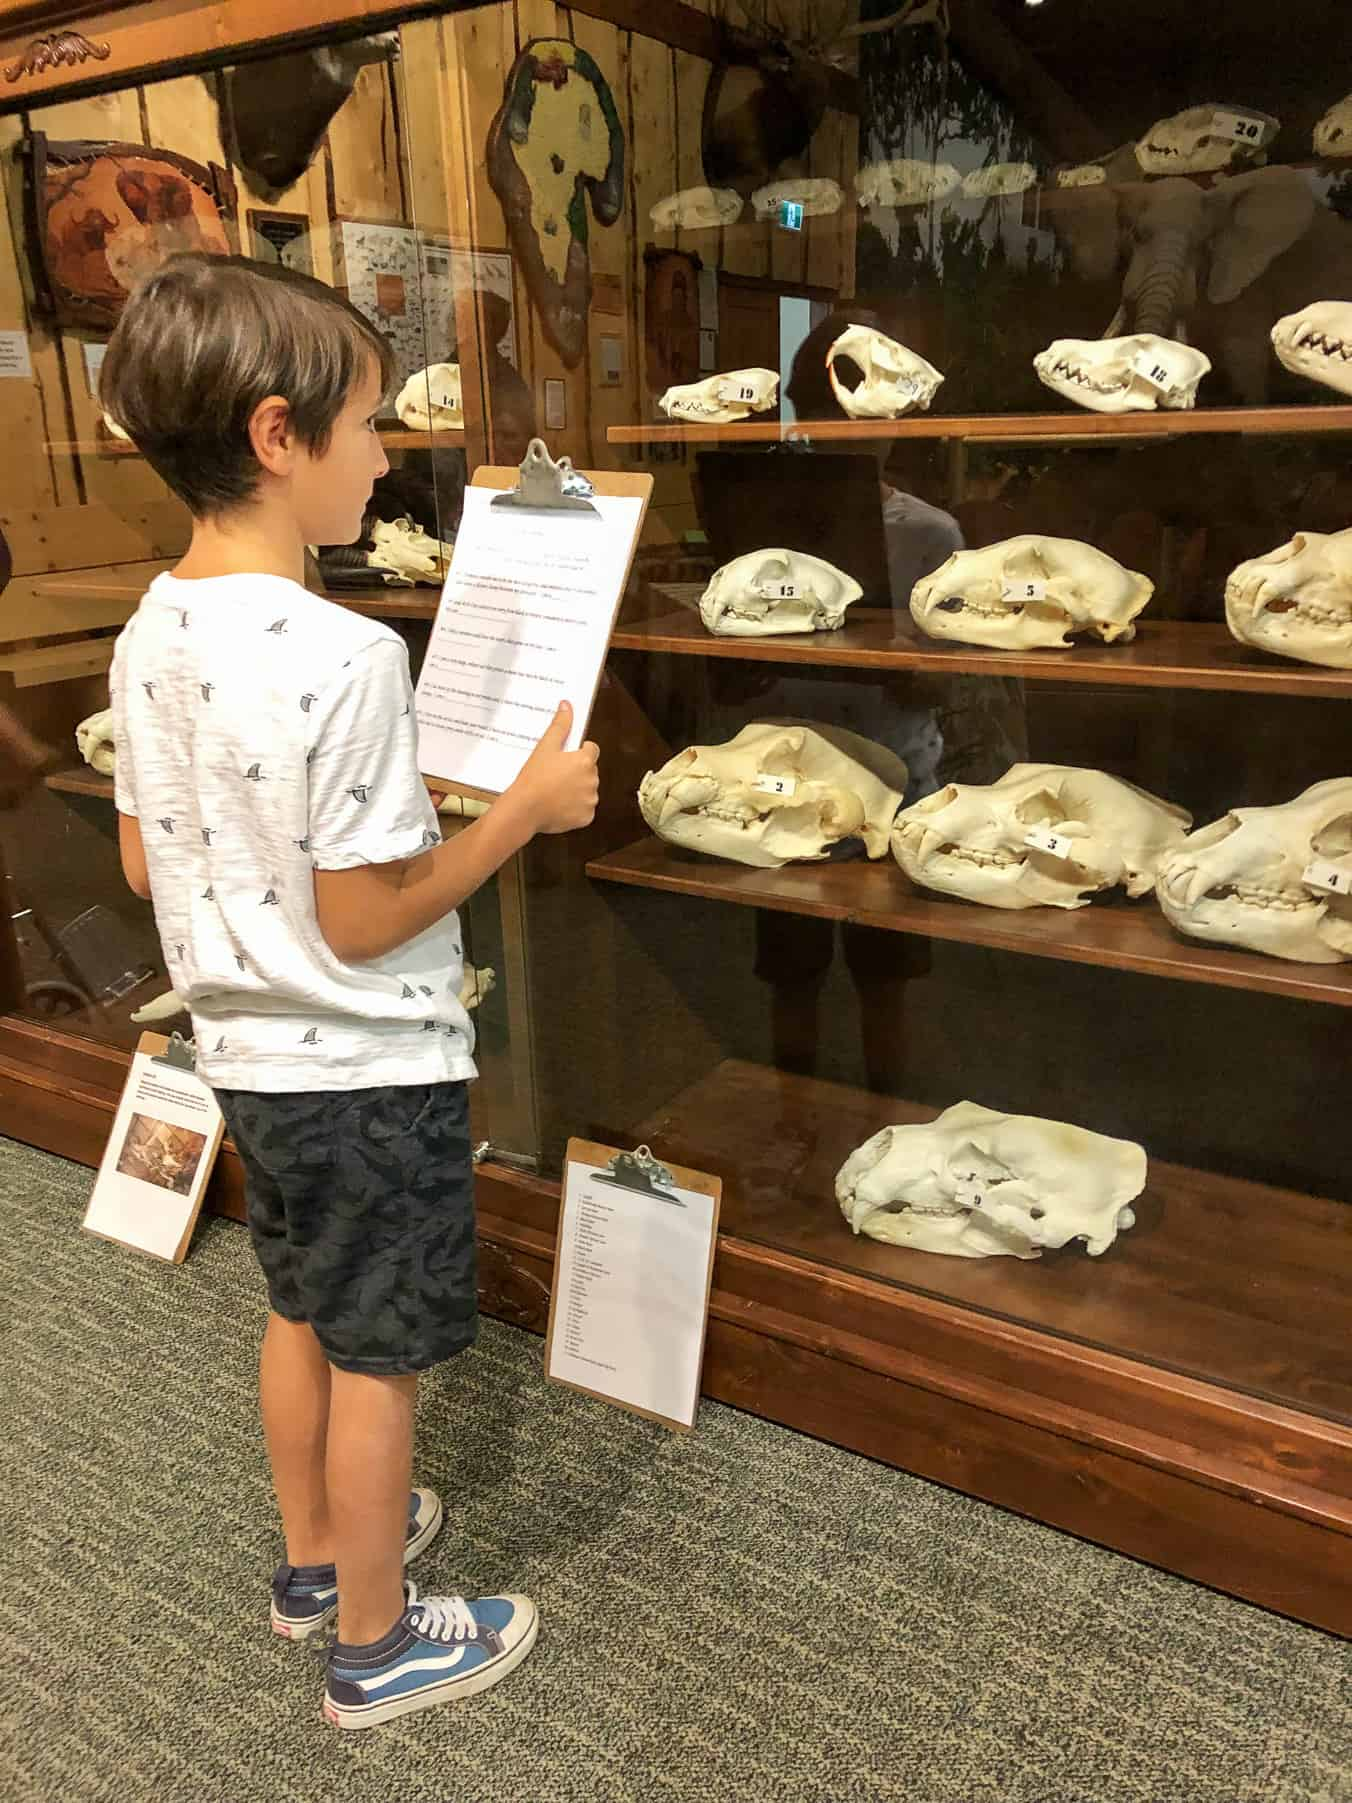 Visit the Sundre Pioneer Village Museum